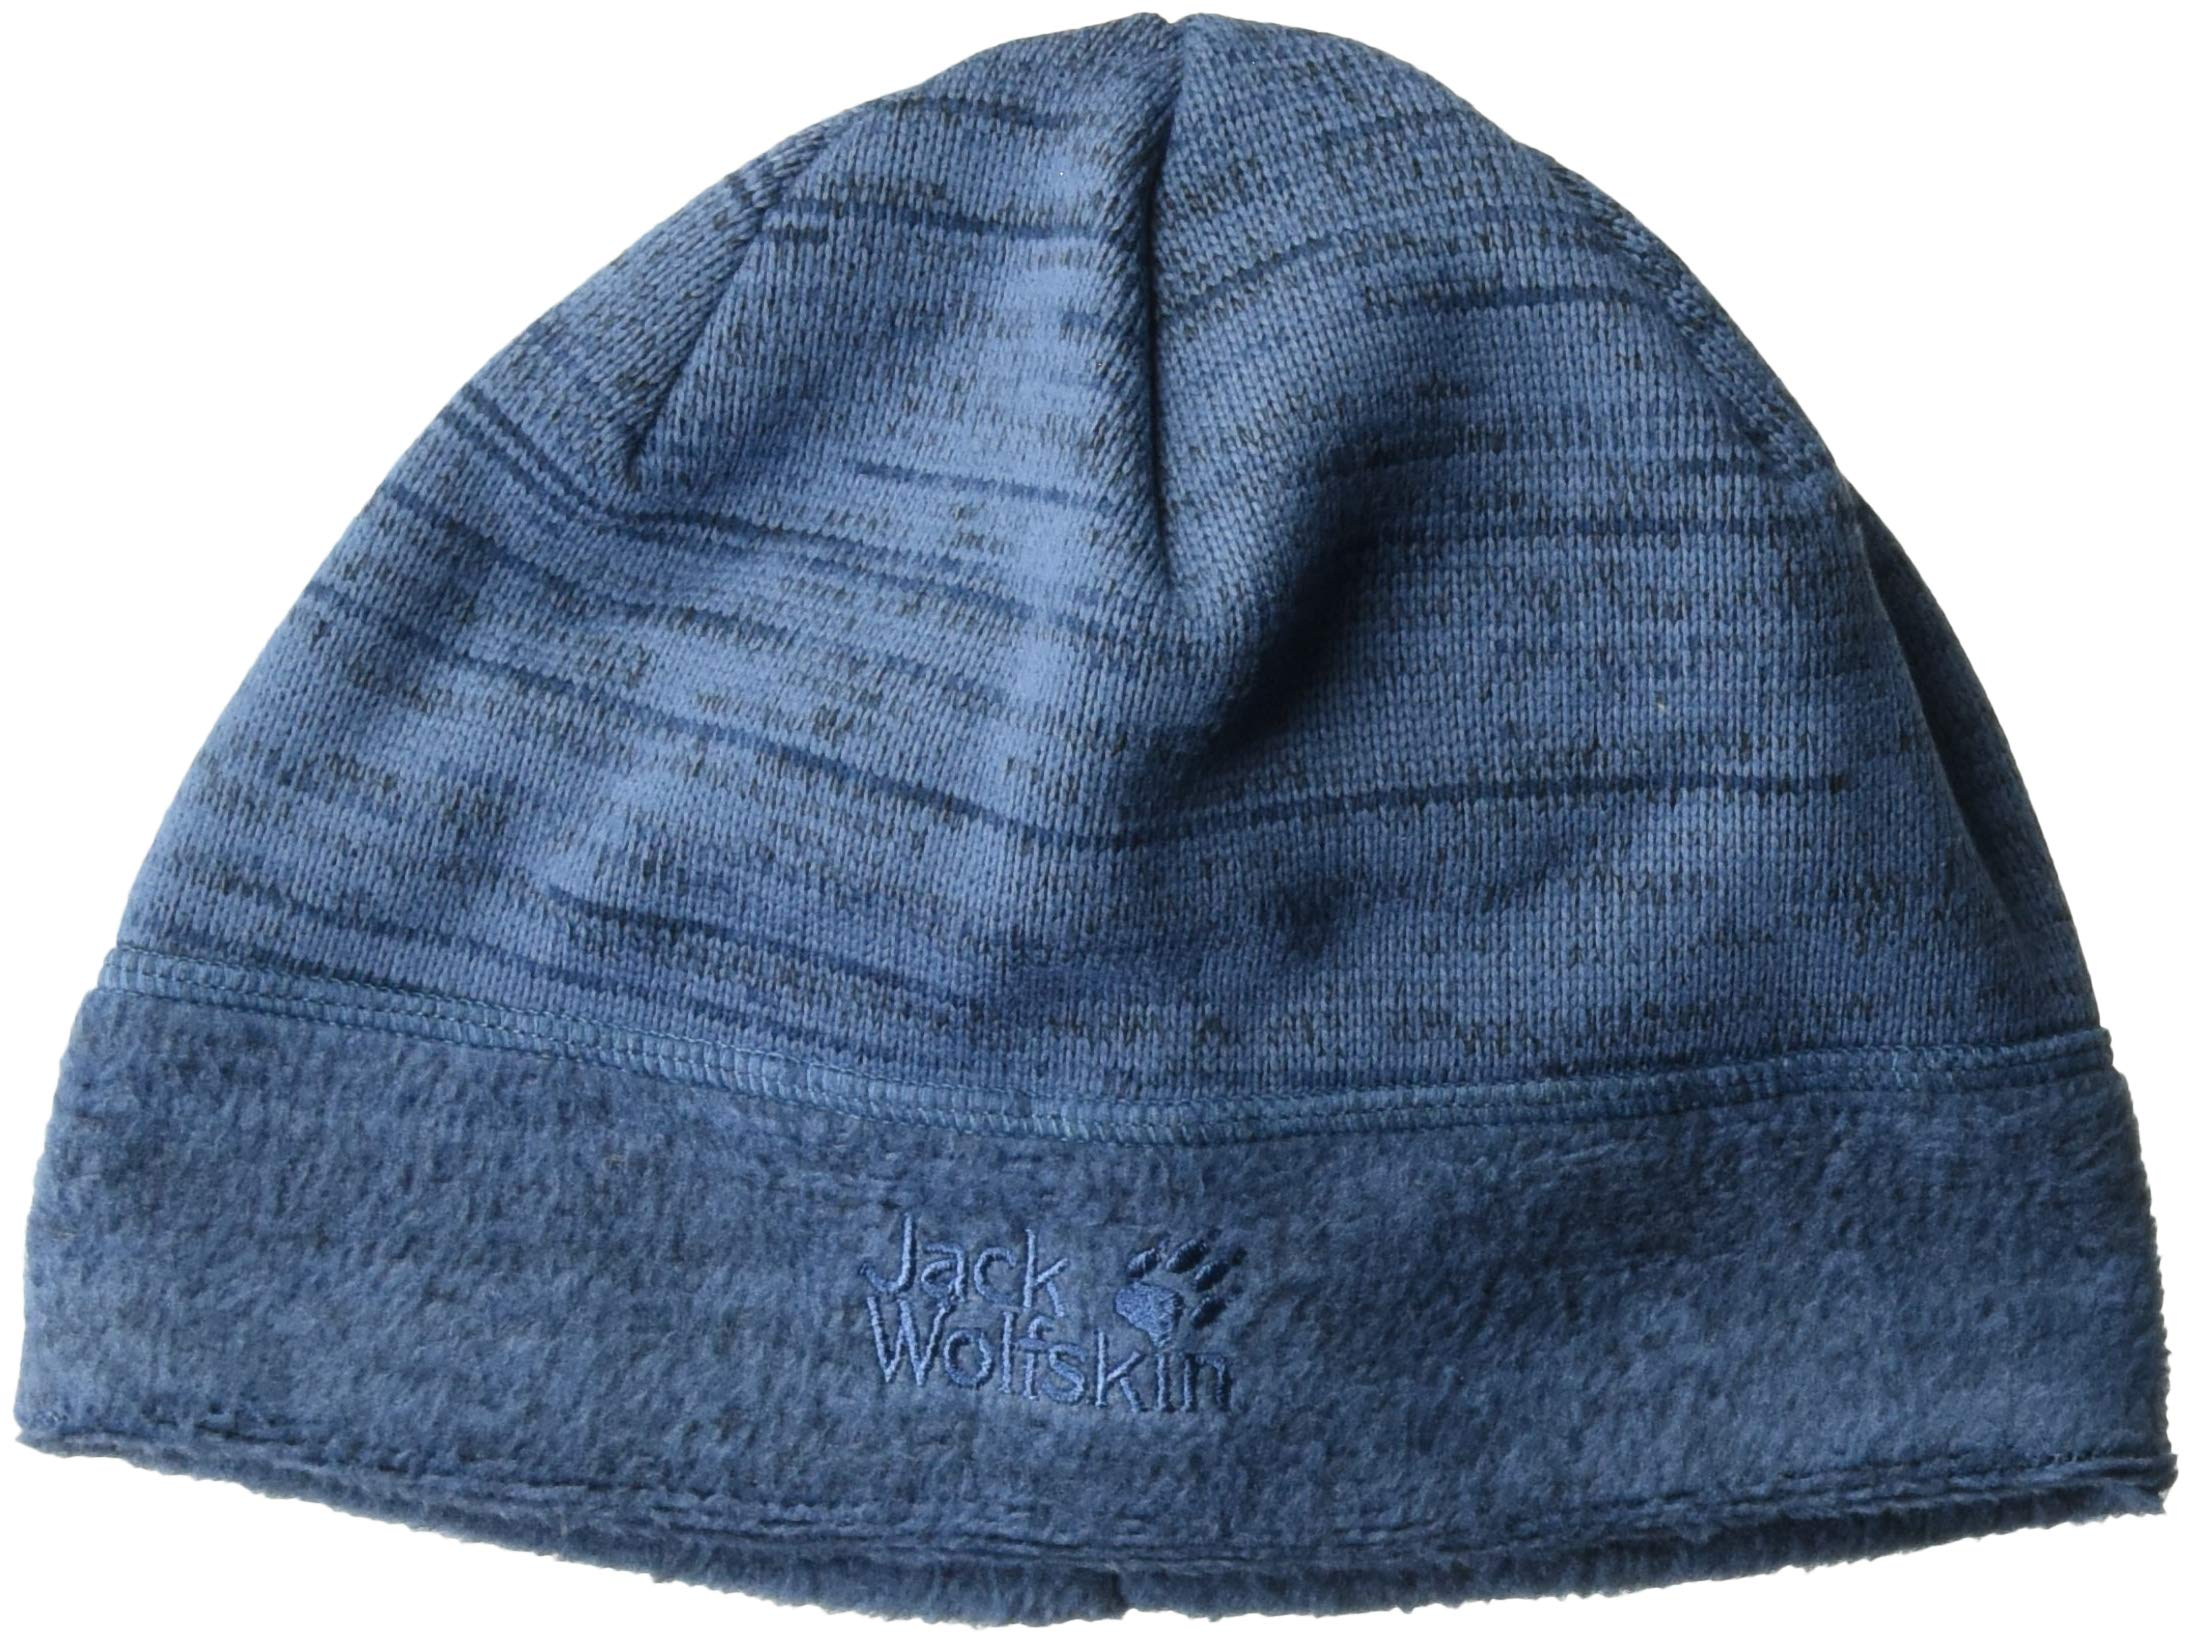 Jack Wolfskin Aquila Fleece Beanie Hat, Ocean Wave, Medium